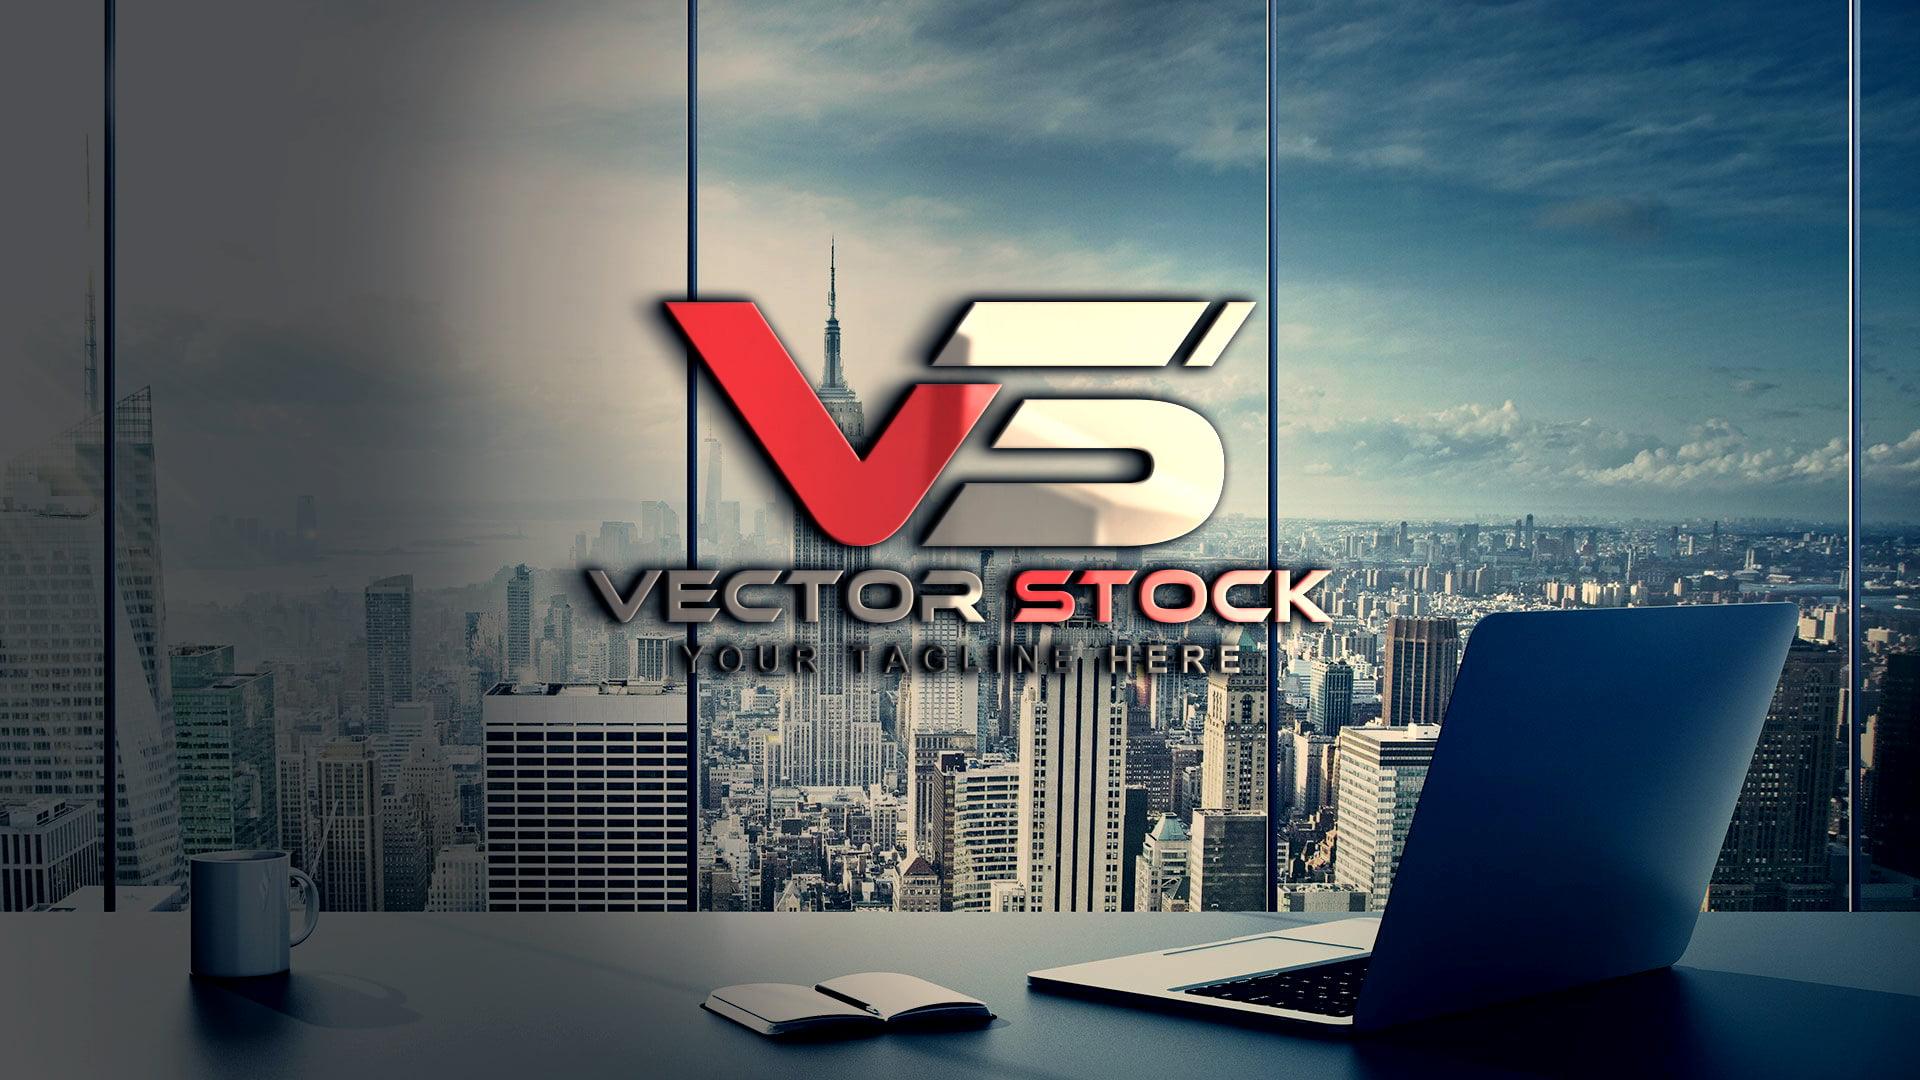 Free Vector Stock Logo Download